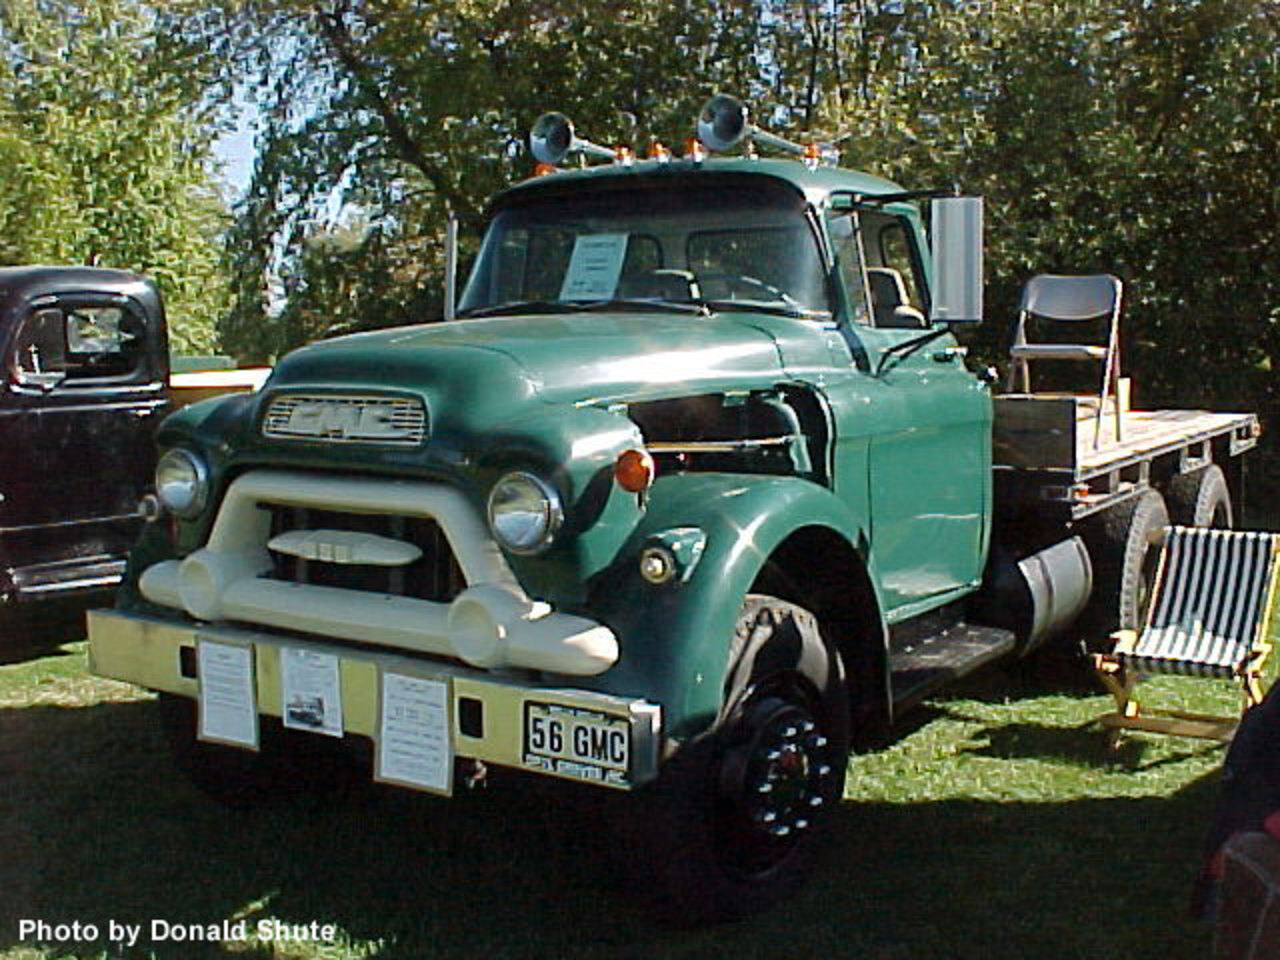 Ram Rt For Sale >> TopWorldAuto >> Photos of GMC 550 - photo galleries